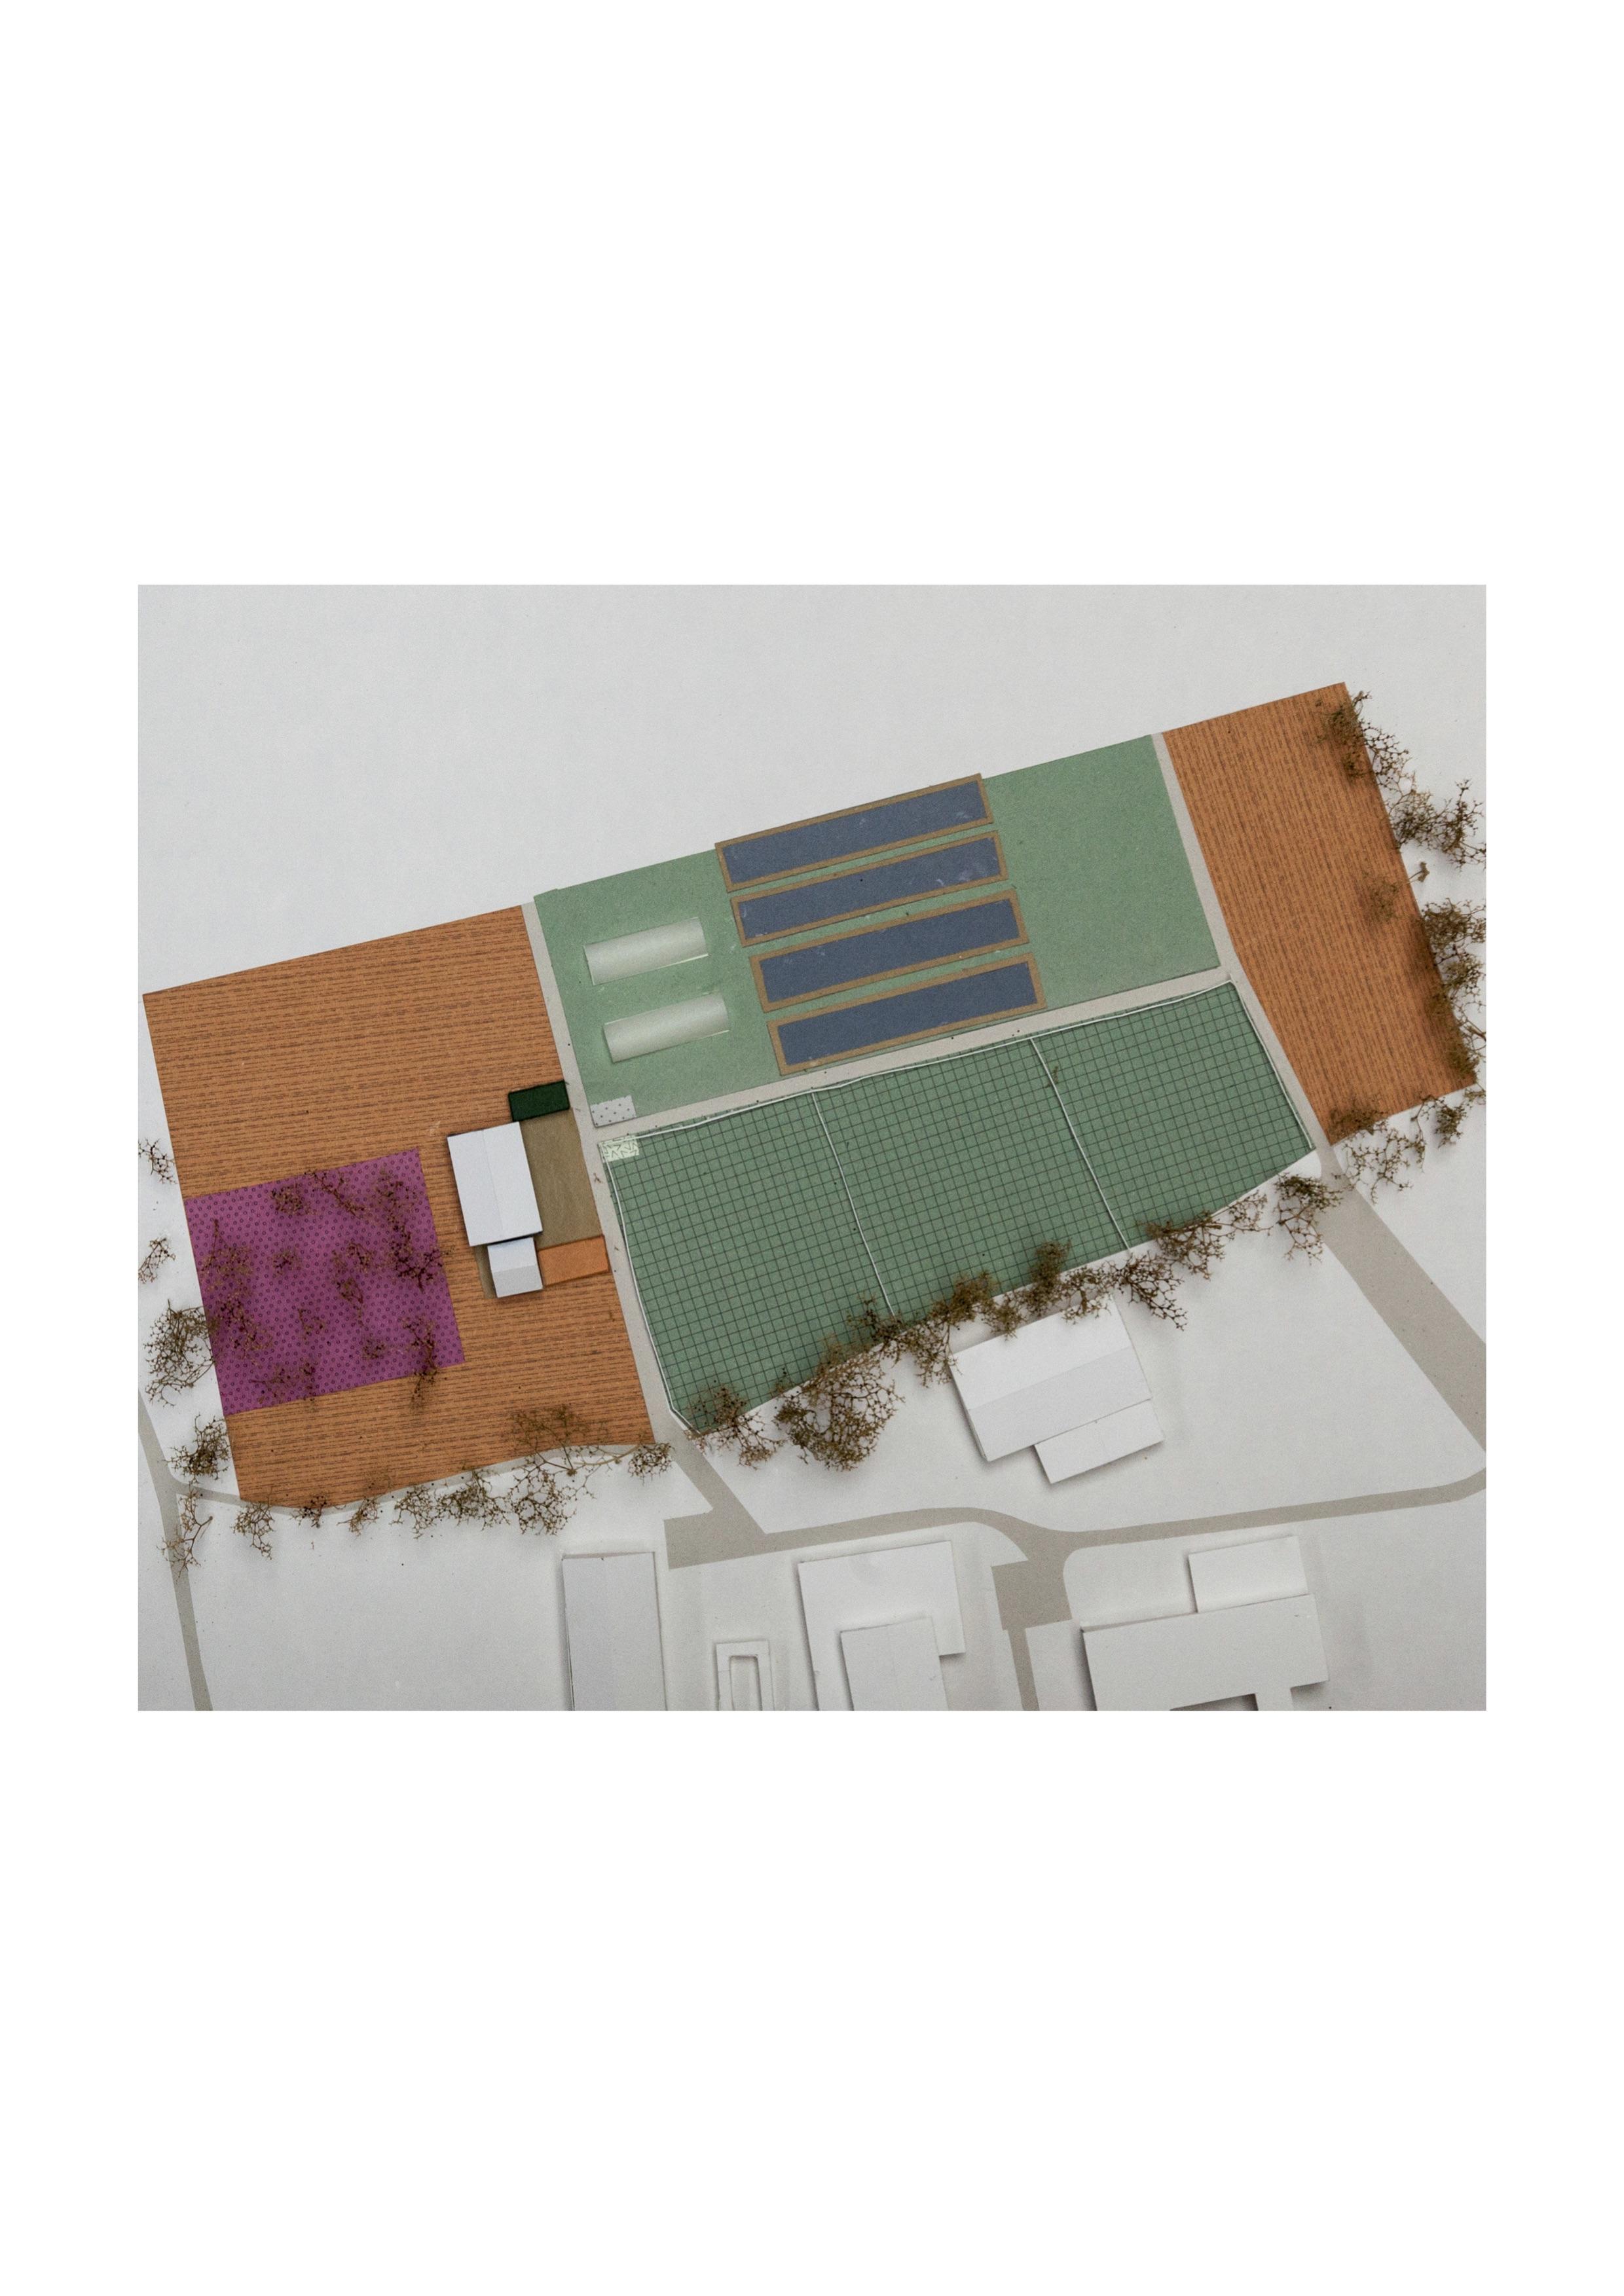 1003_Totteridge Farm Site Model Photo.jpg